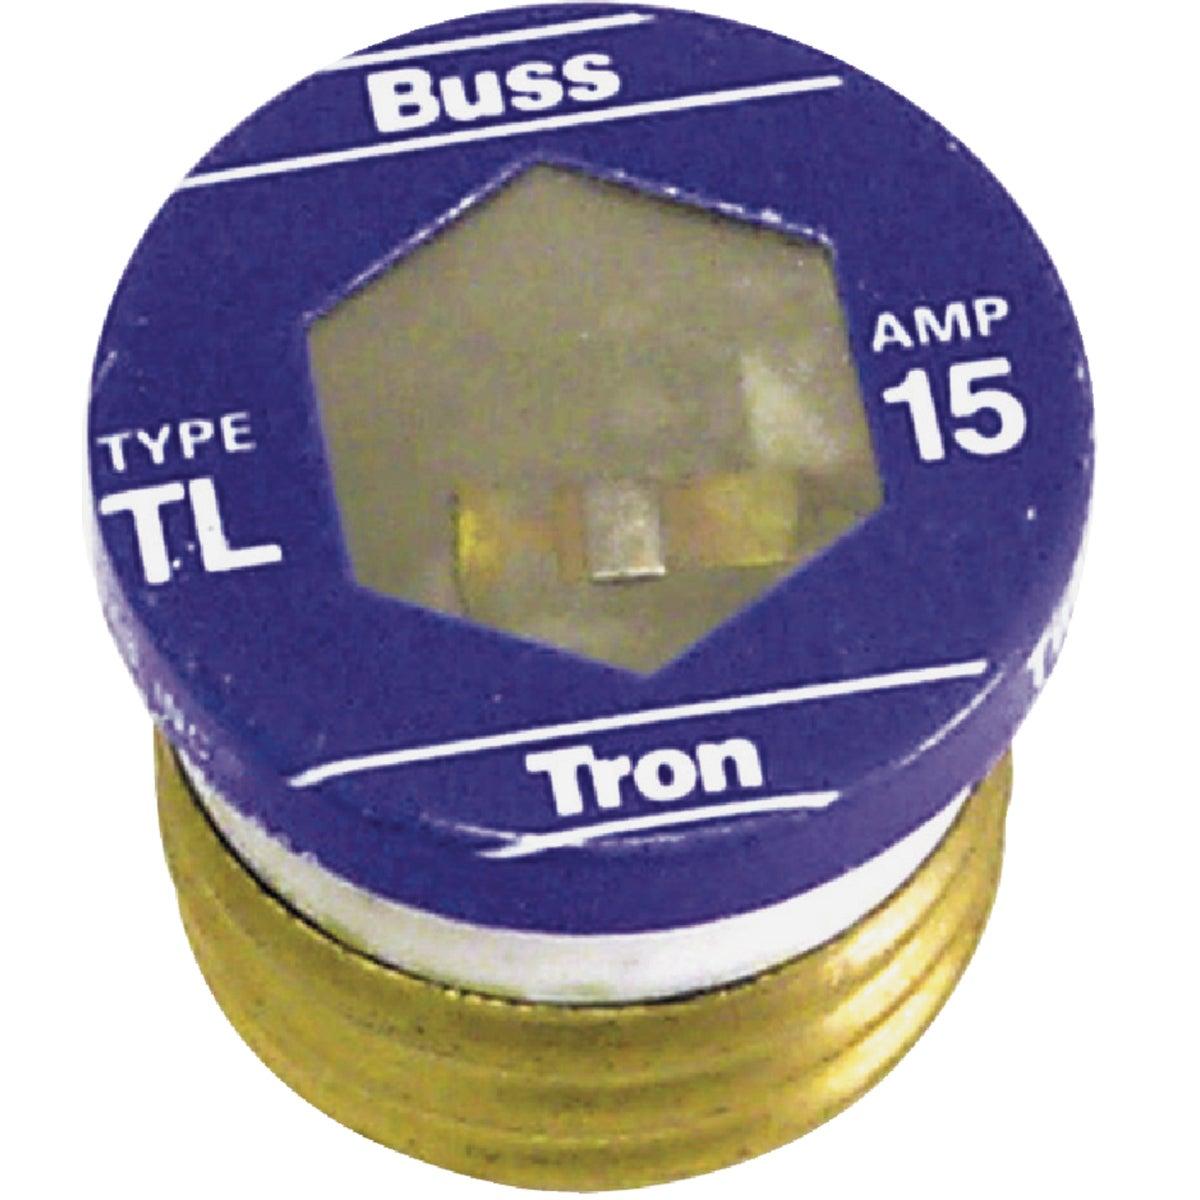 Bussmann 15A BP/TL Time-Delay Plug Fuse (3-Pack)